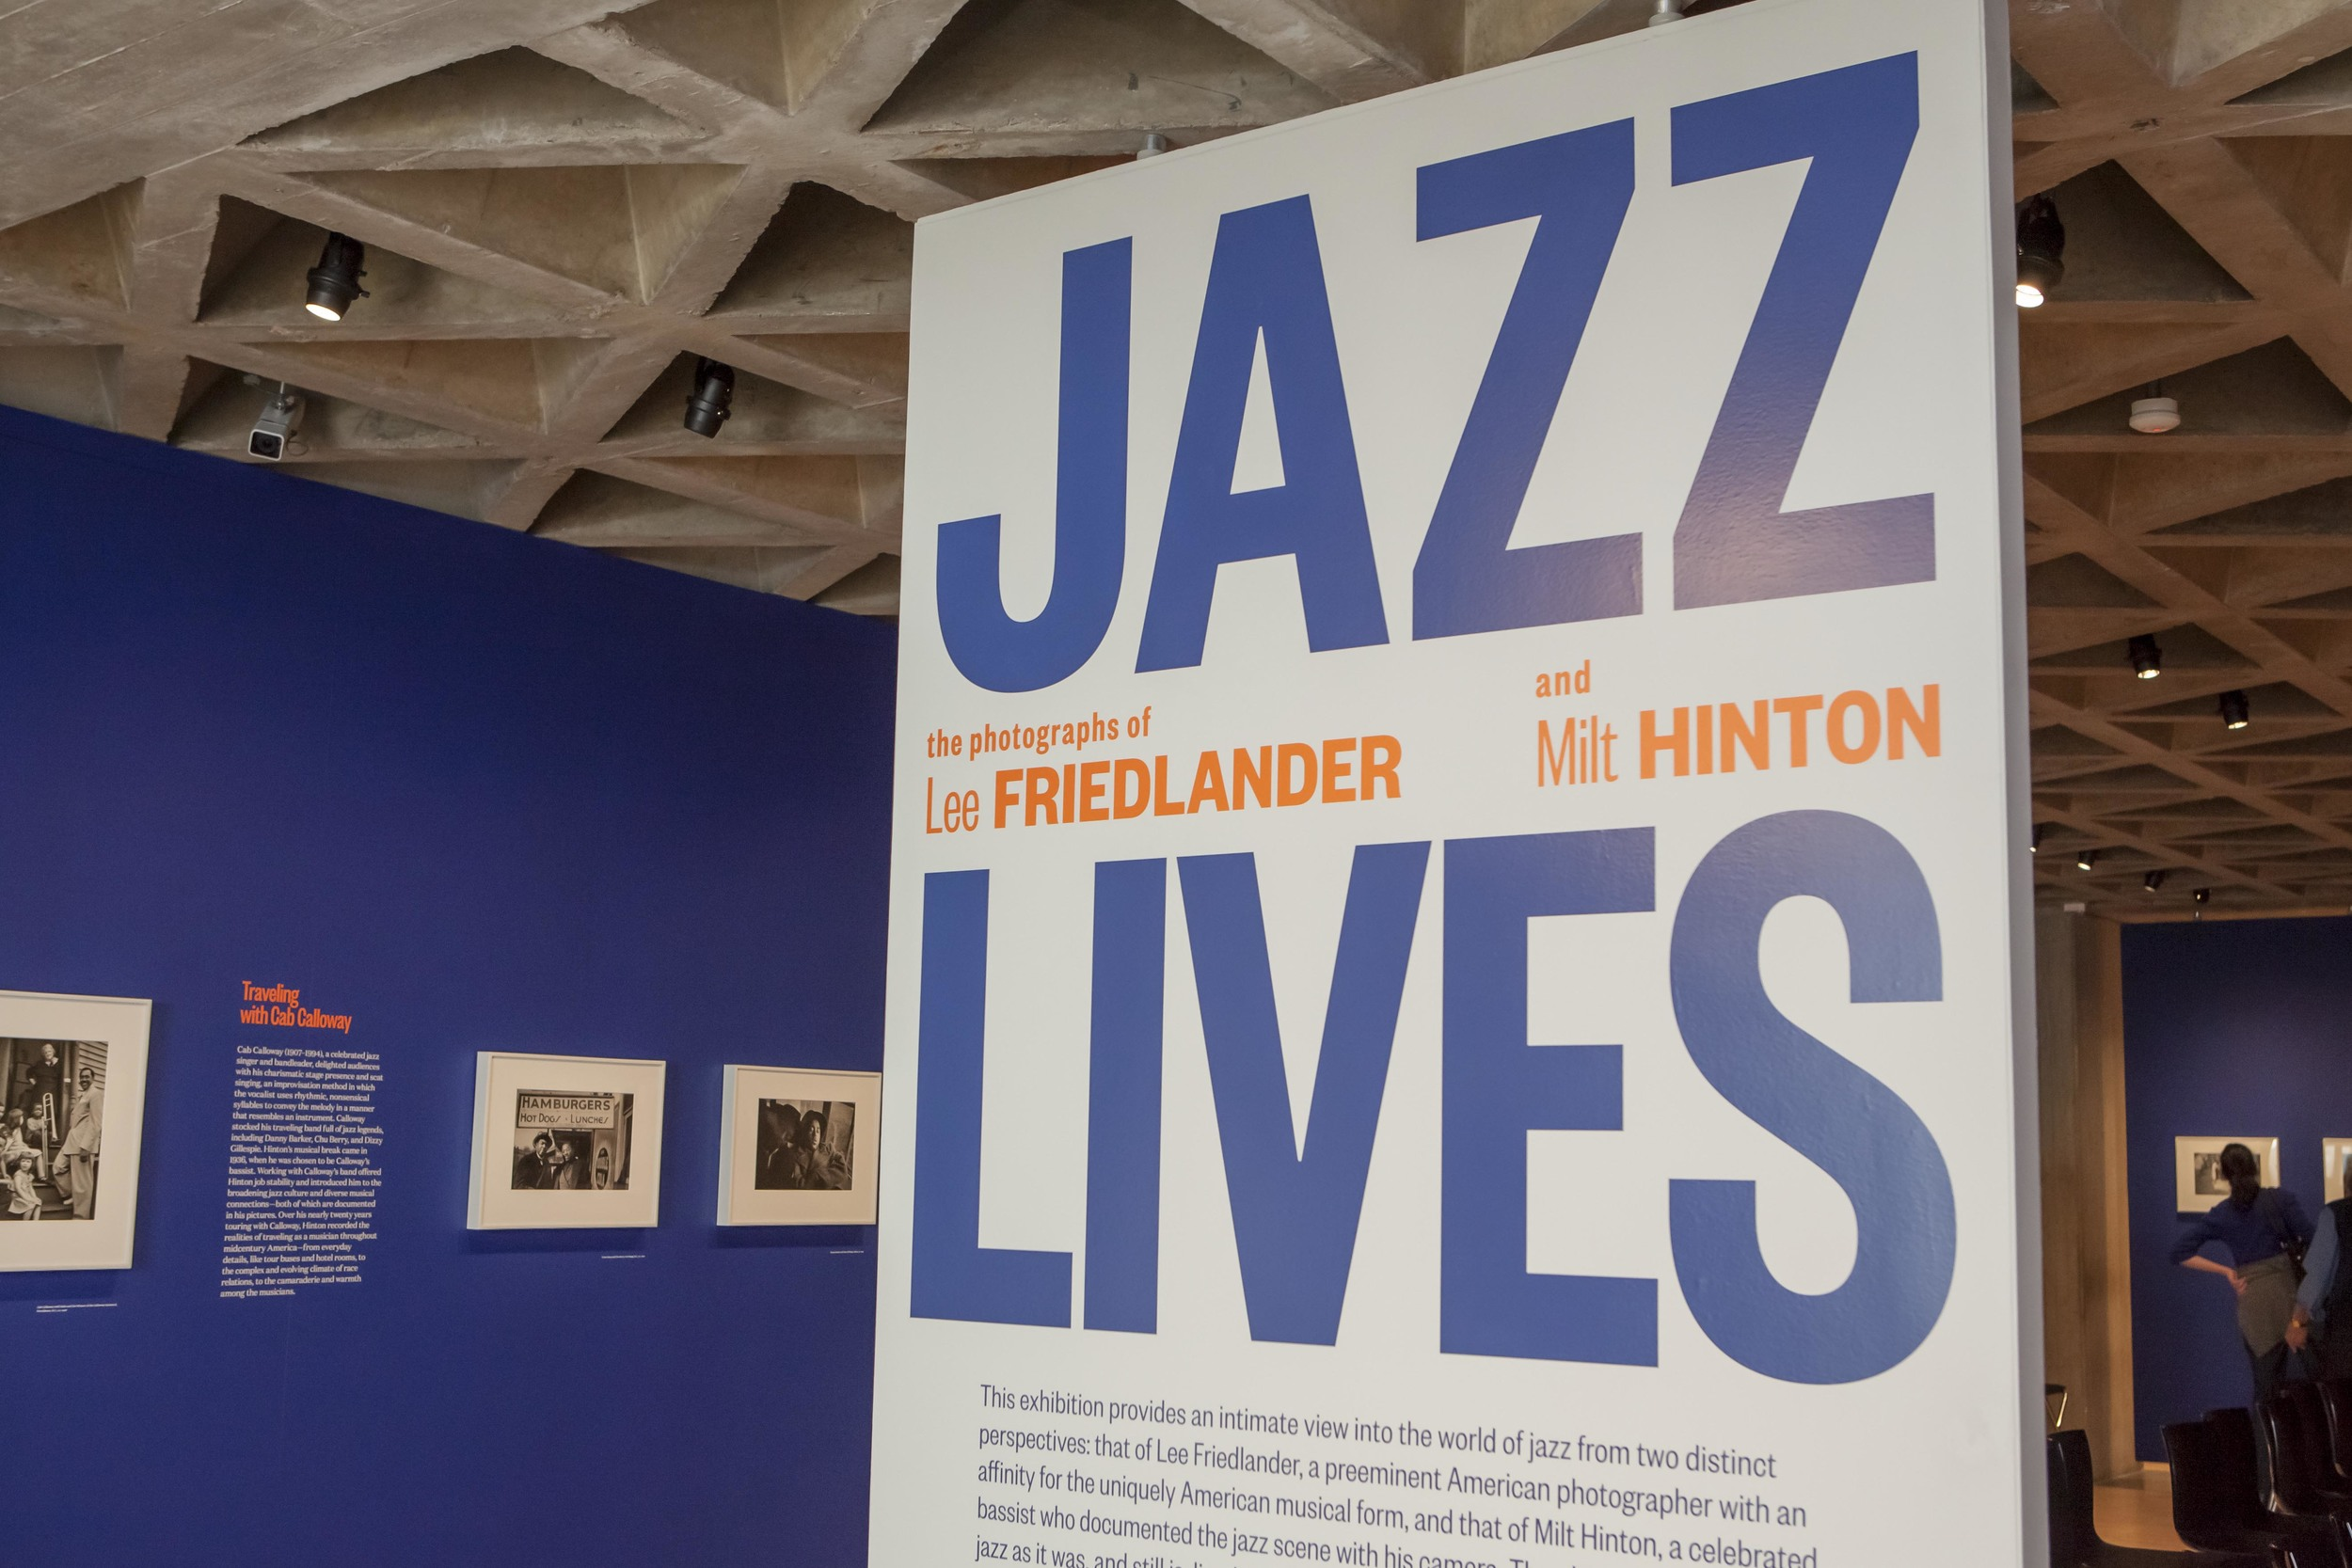 Jazz Lives at the Yale University Art Gallery